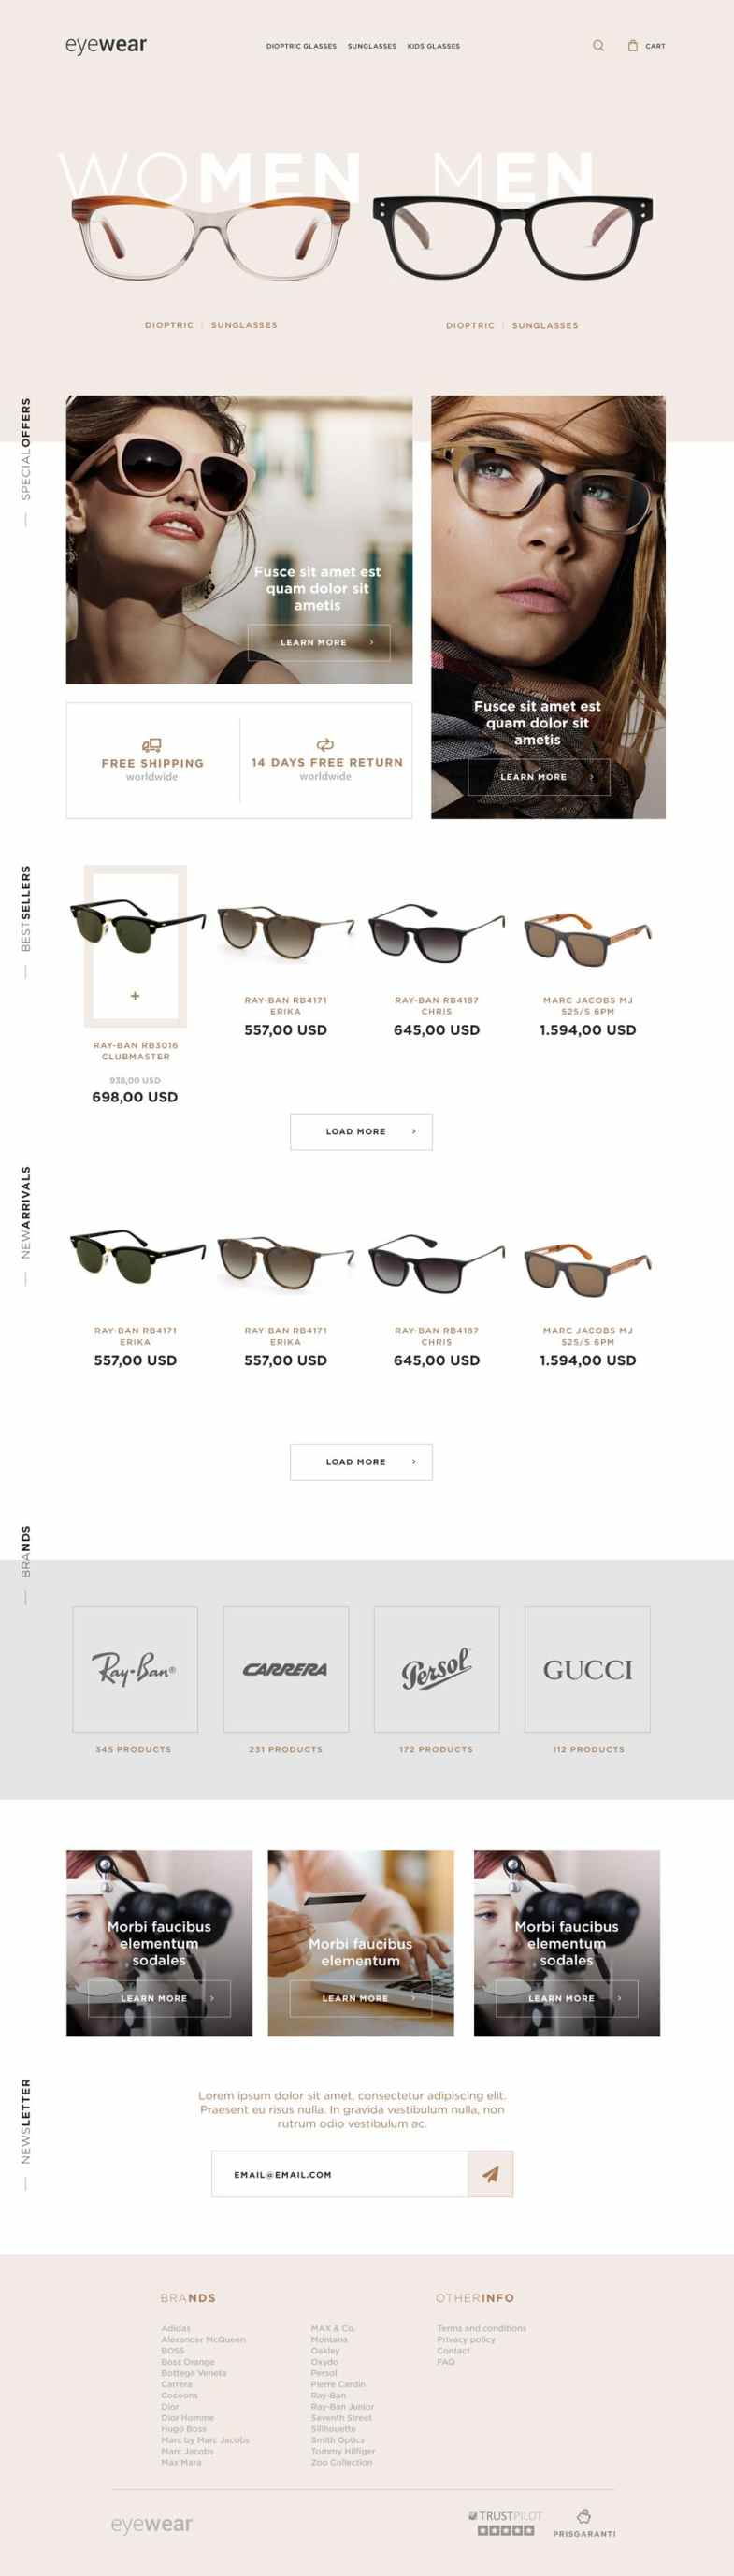 Eyewear E commerce Web Template PSD Бесплатные шаблоны для интернет-магазина psd - Eyewear E commerce Web Template PSD - Бесплатные шаблоны для интернет-магазина PSD